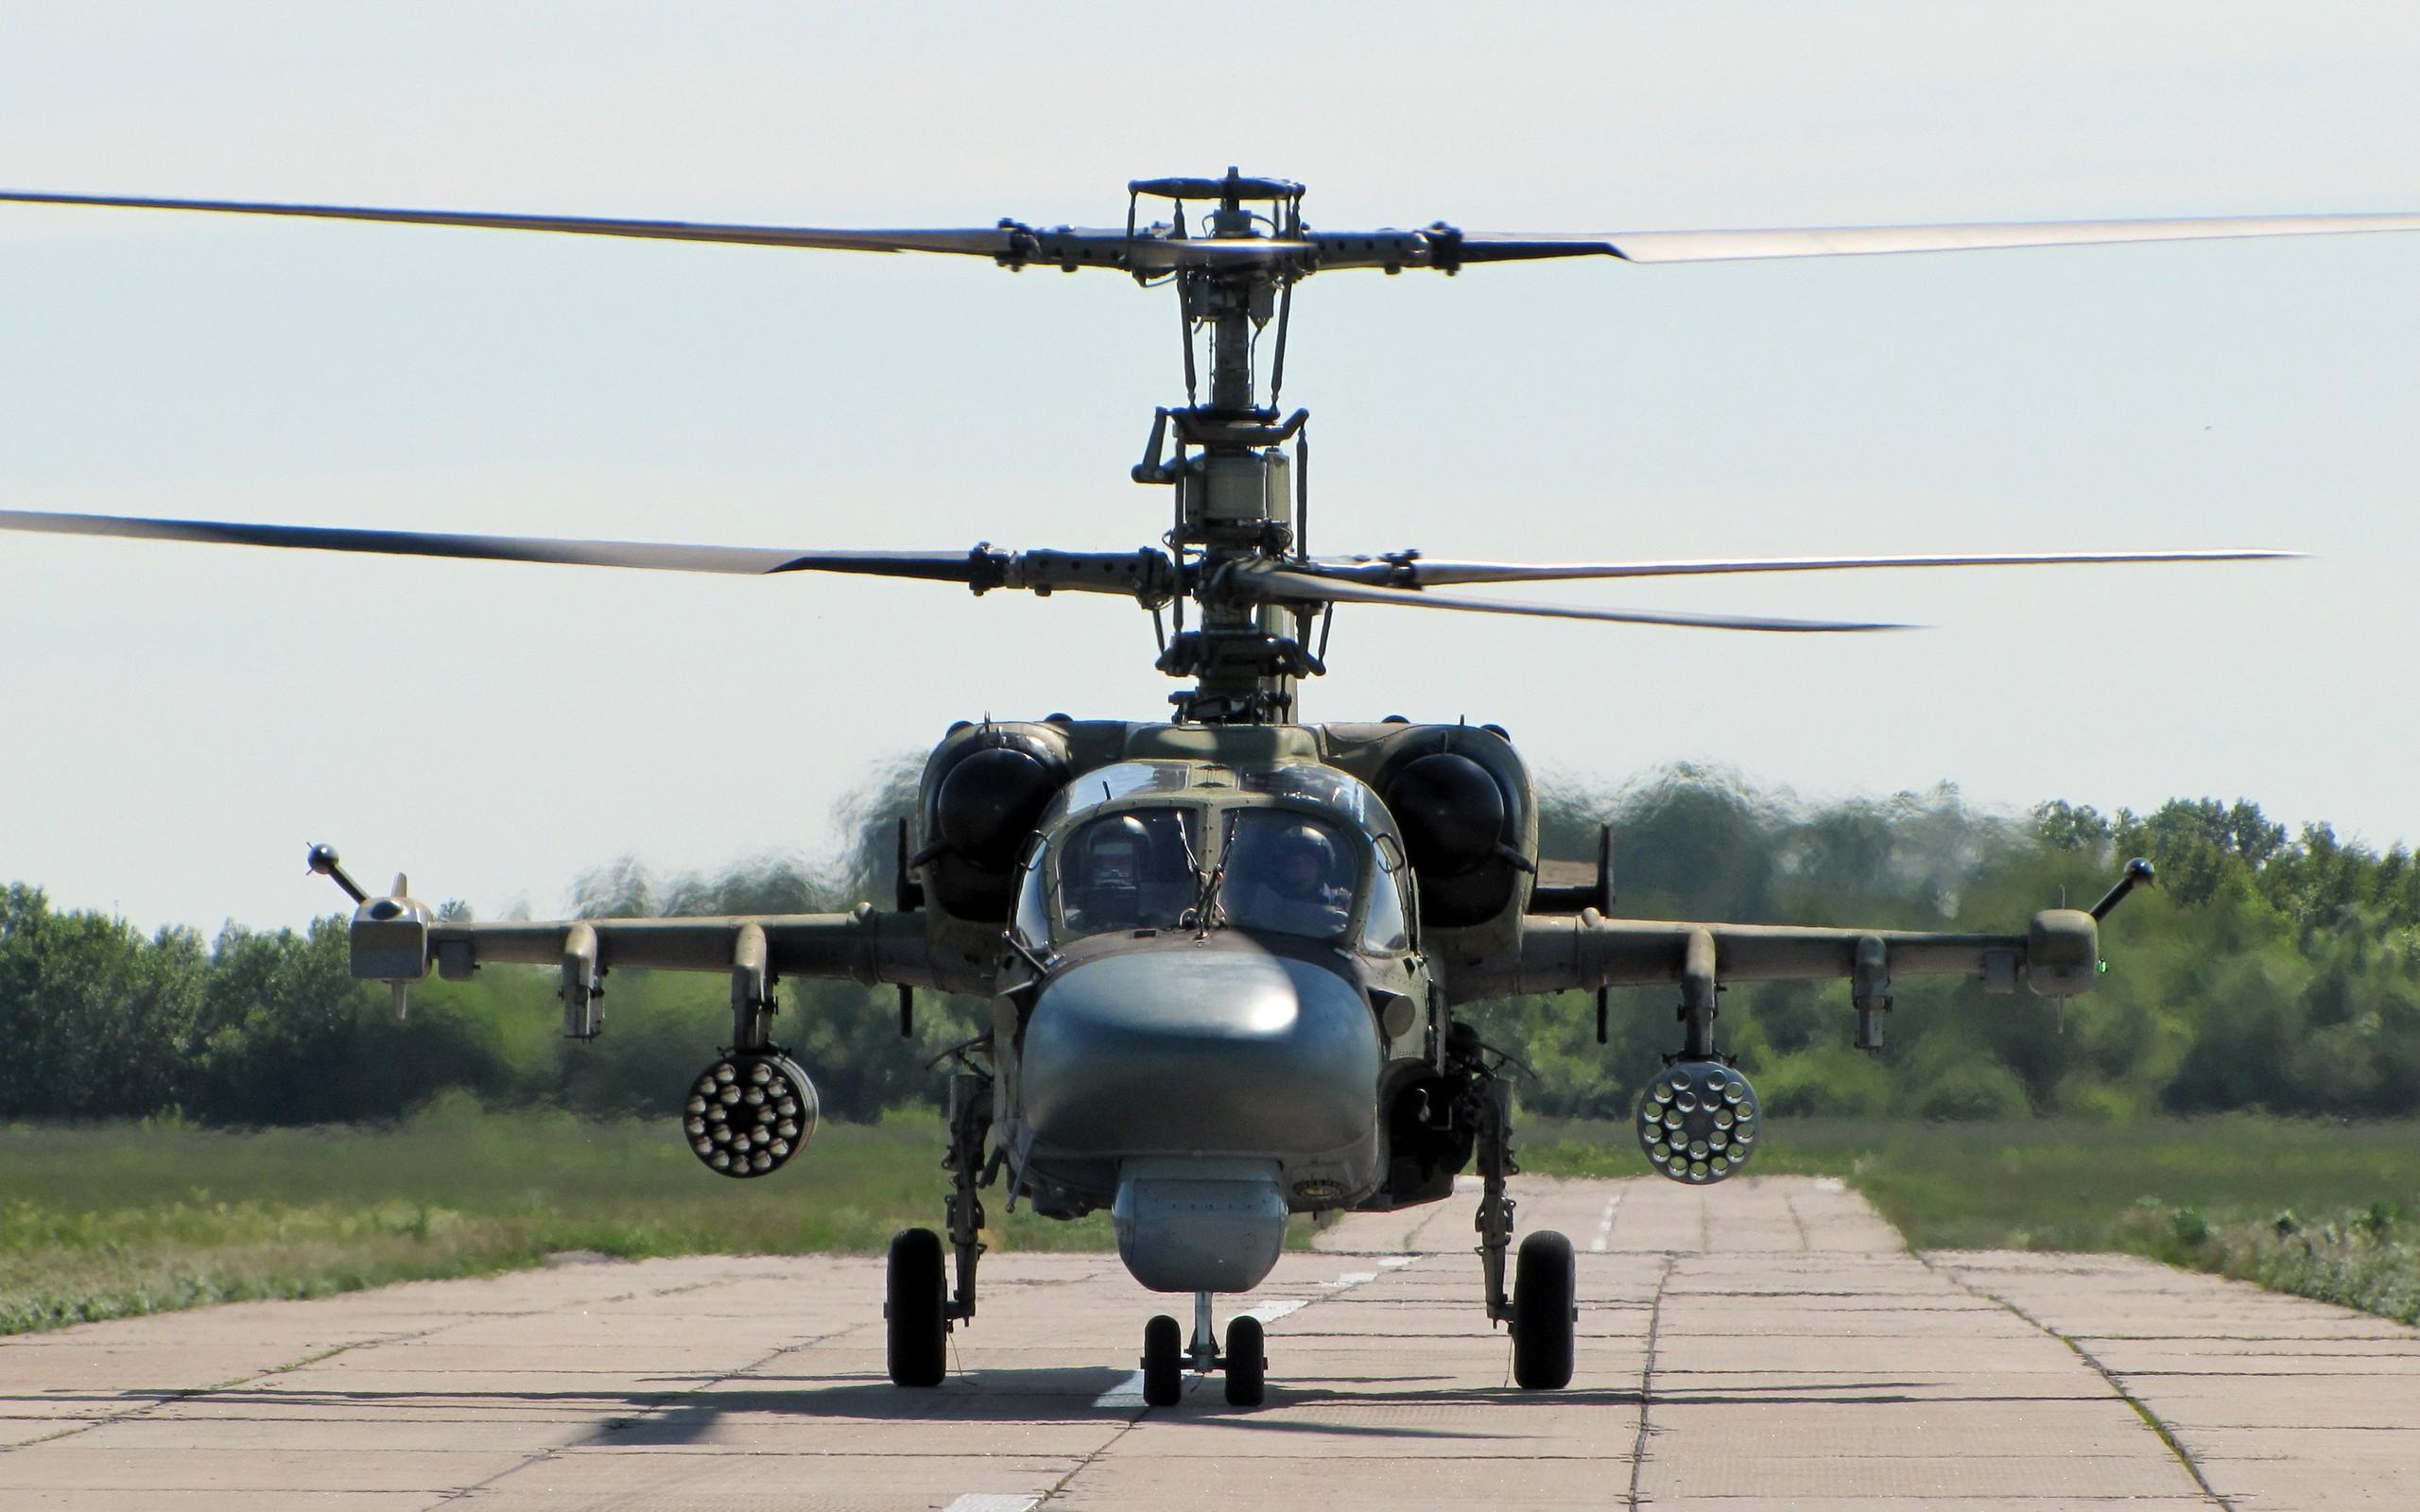 Elicottero Kamov : Papel de parede veículo guerra avião militares